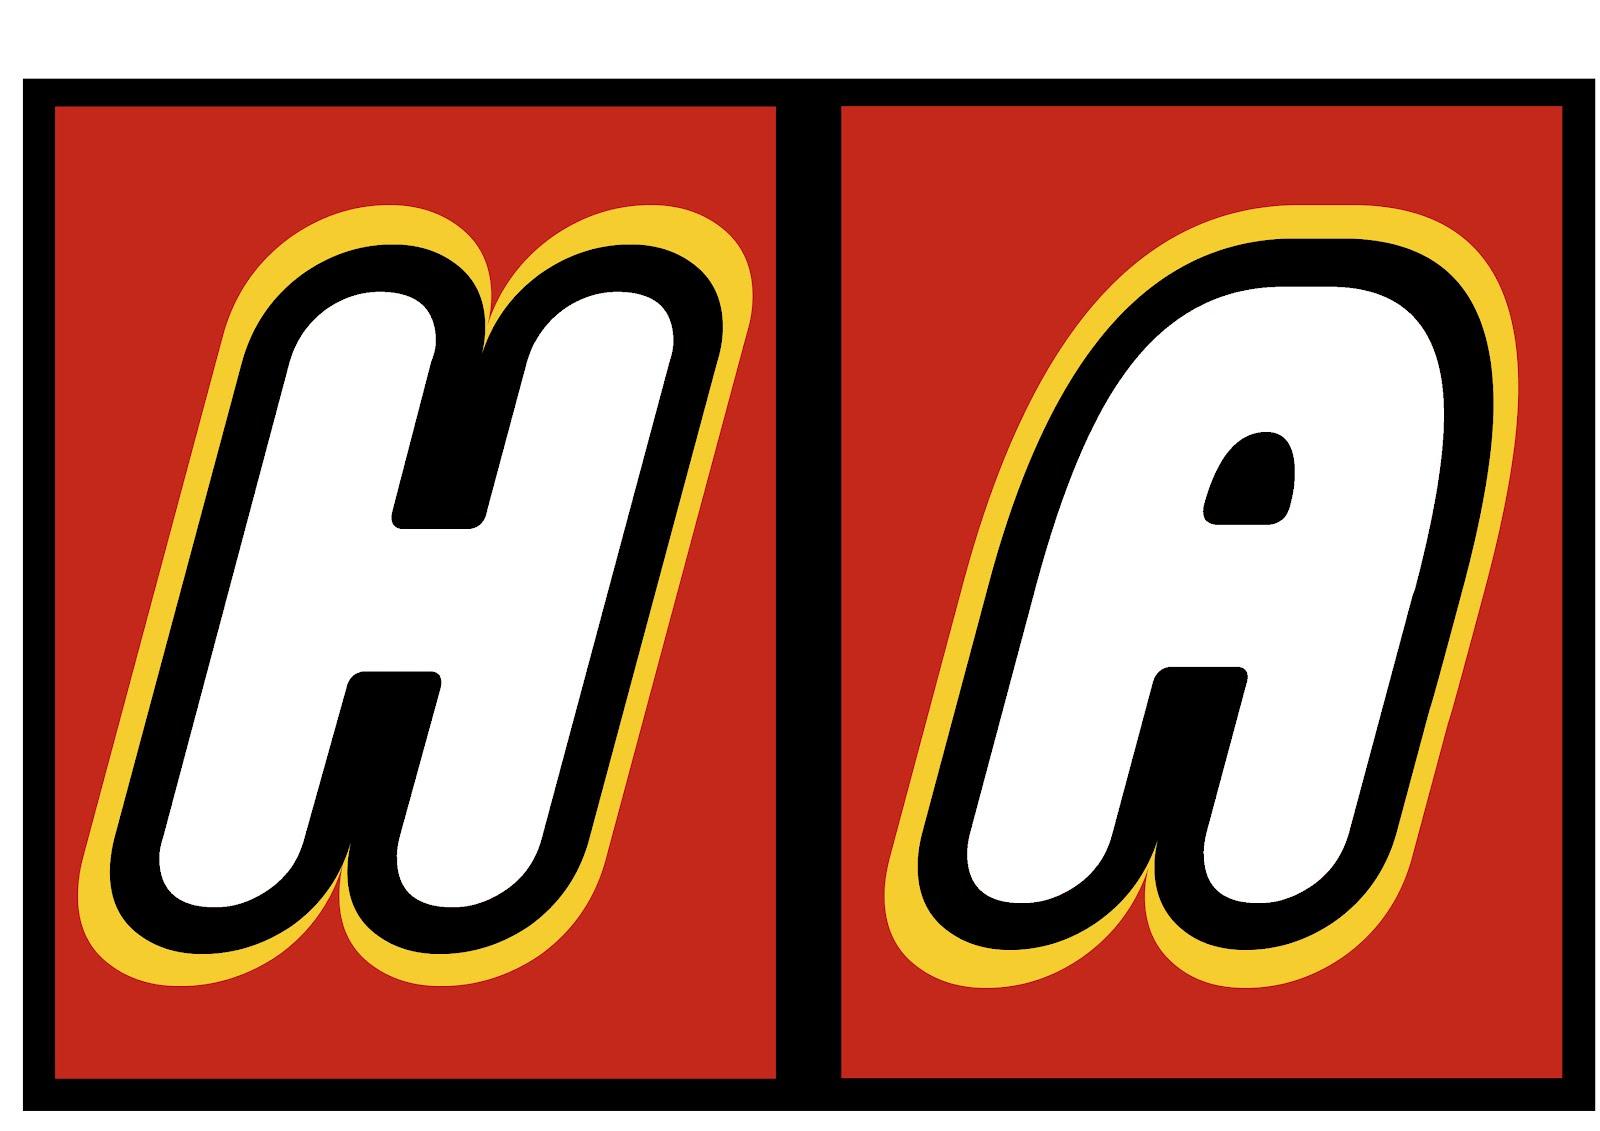 Http Halegrafx Com Printables Free Printable Lego Building Block Birthday Banner